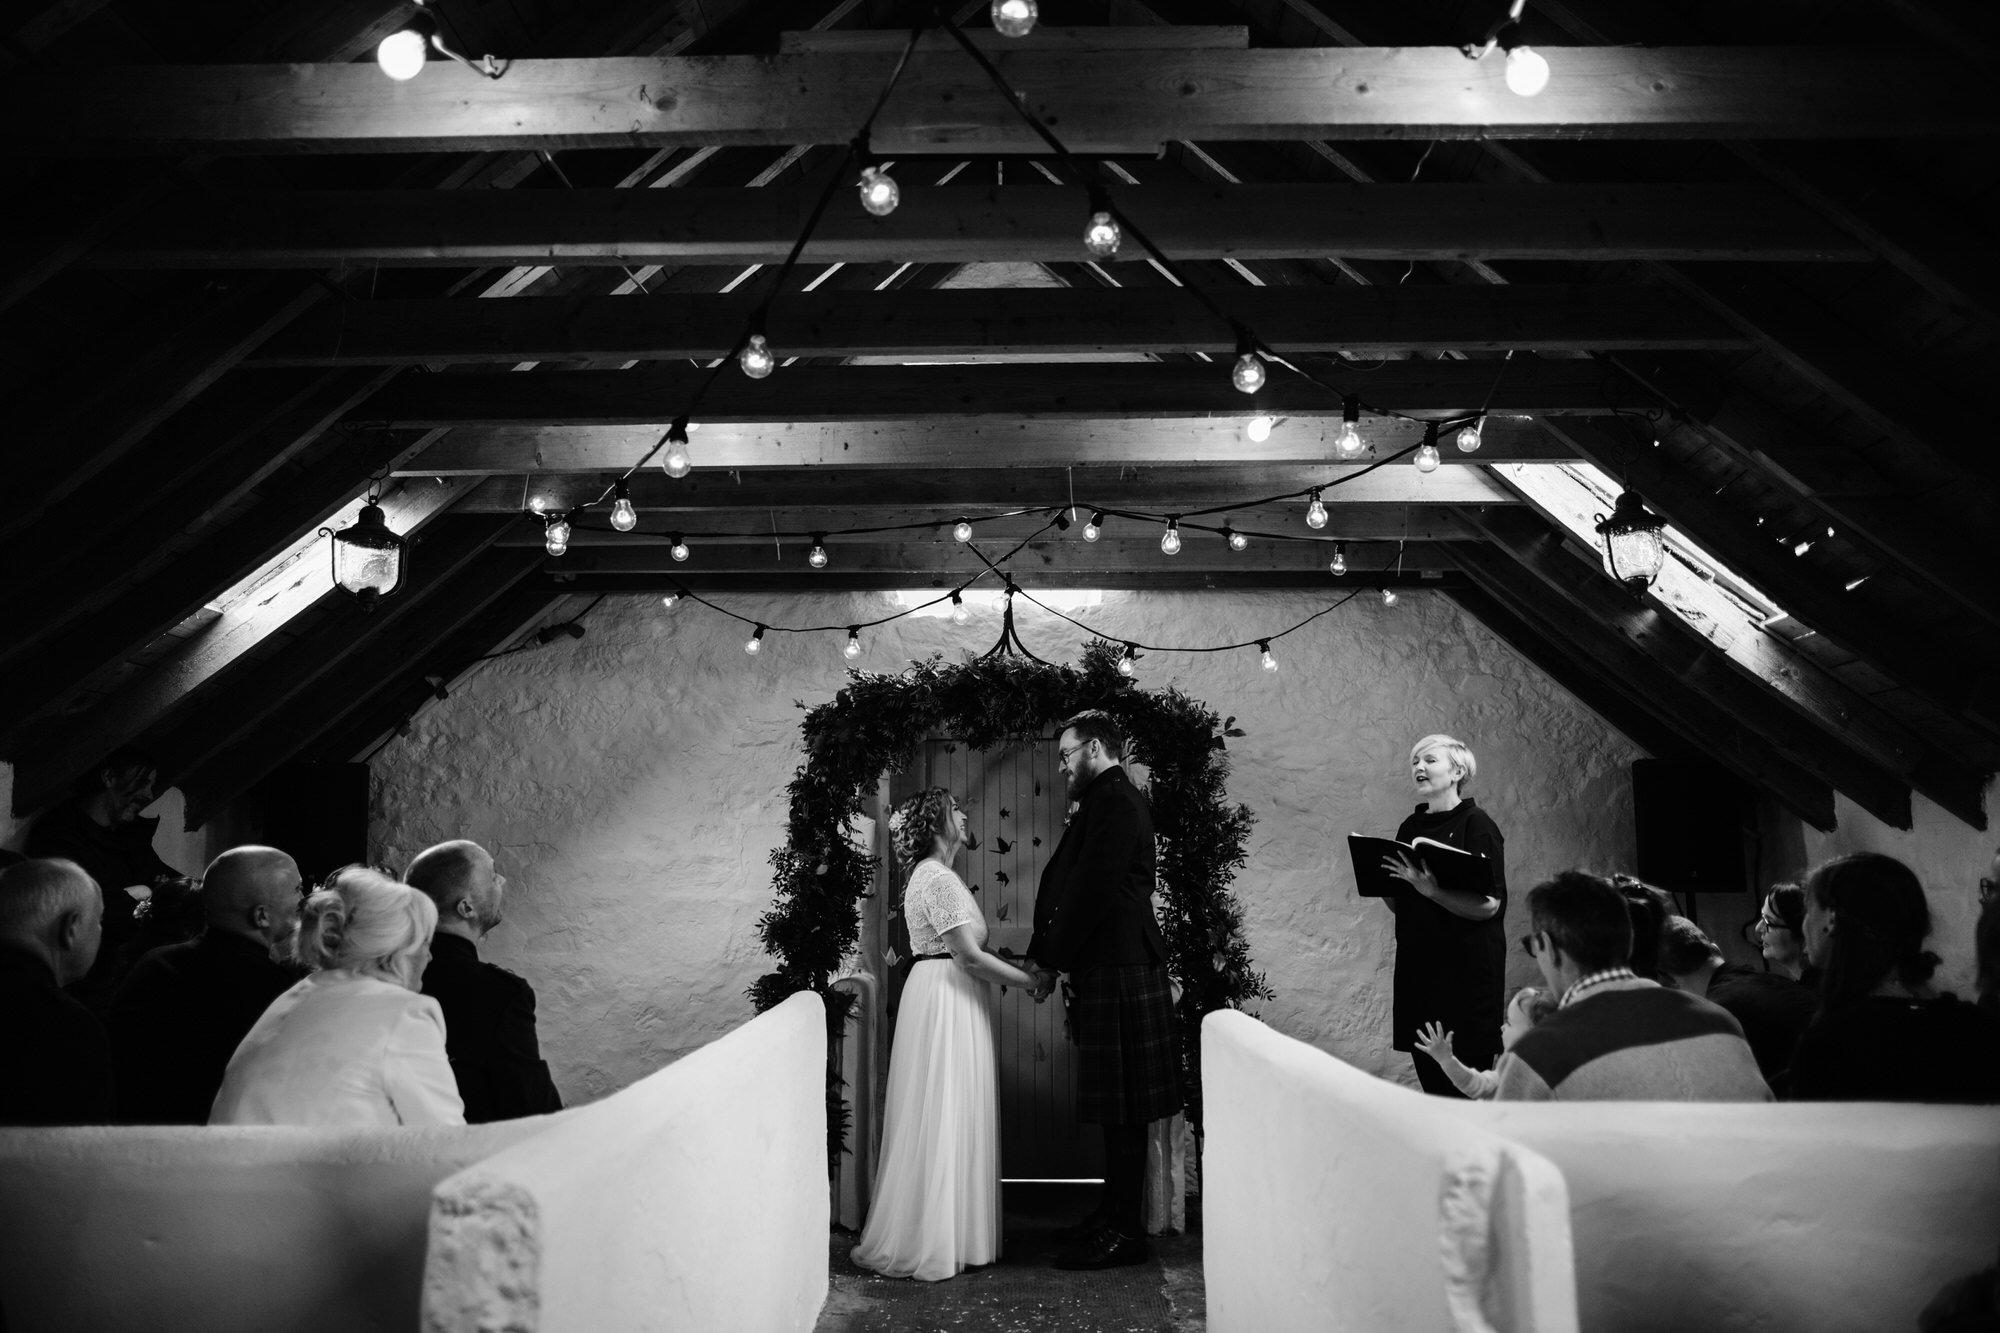 026 TIN SHED KNOCKRAICH WEDDING AUSTRIAN SCOTTISH ZOE ALEXANDRA PHOTOGRAPHY